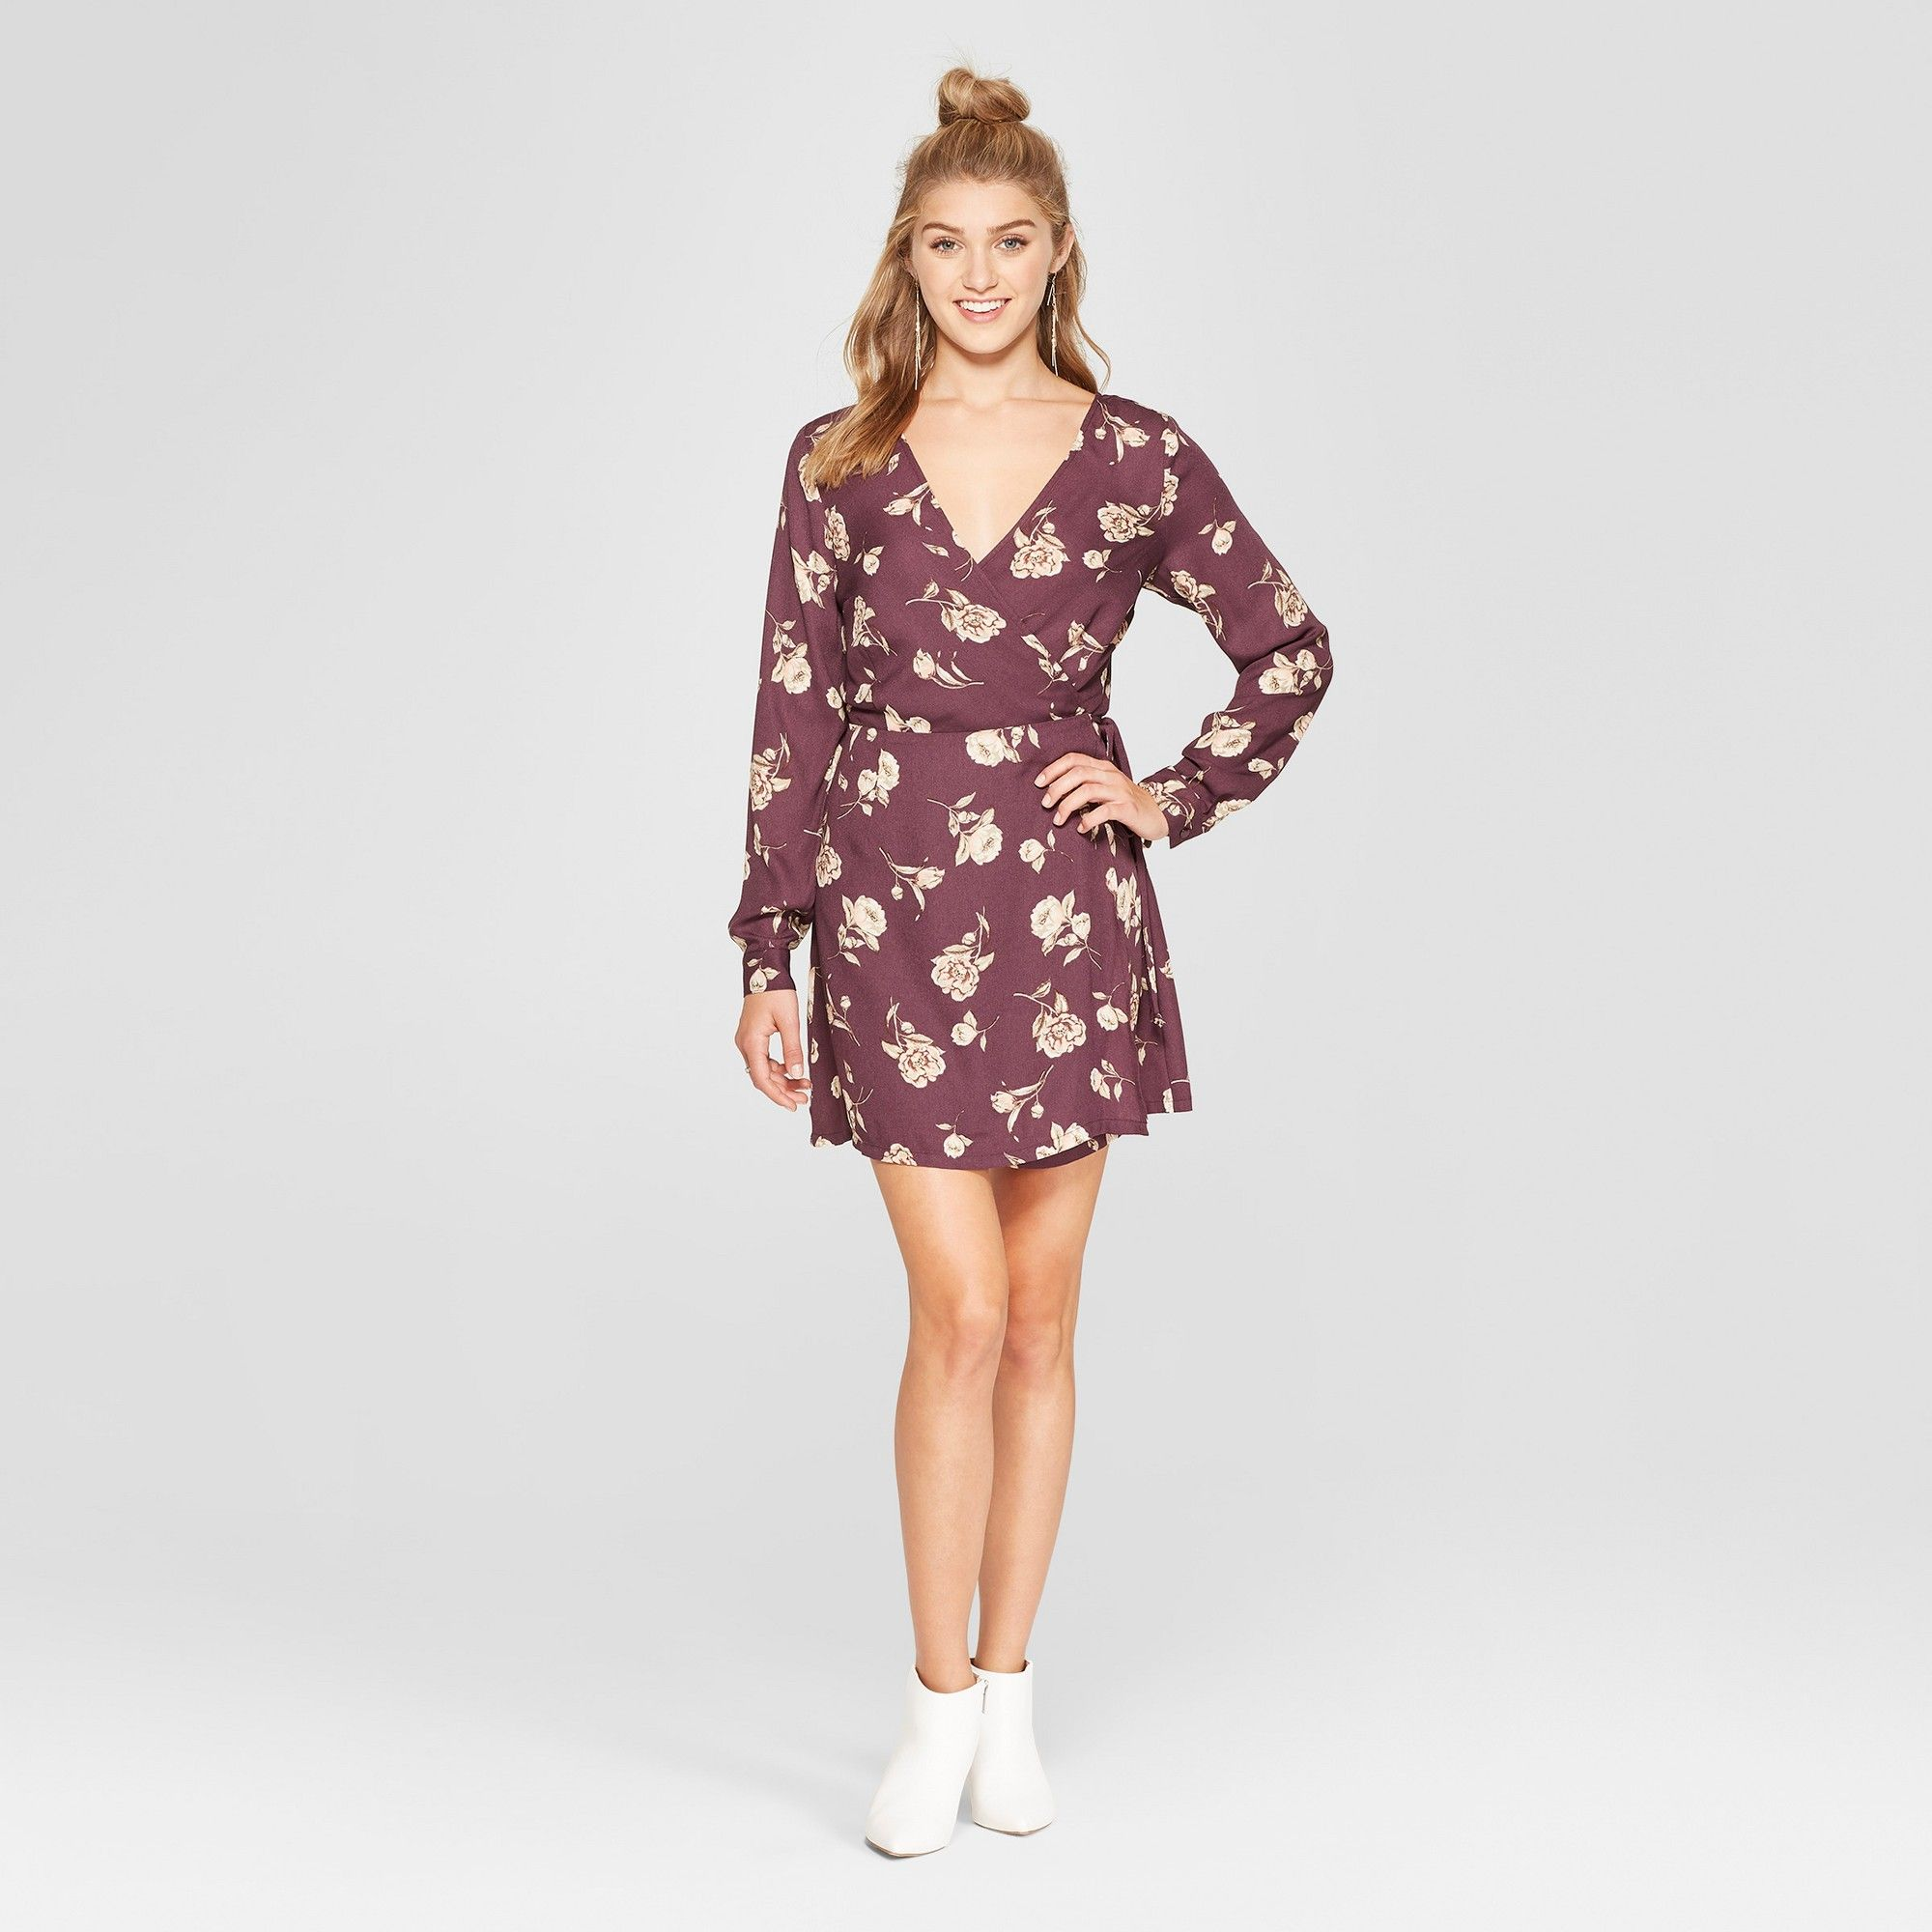 49af0ee14878 Women s Floral Print Long Sleeve Wrap Dress - Xhilaration Purple Xxl ...